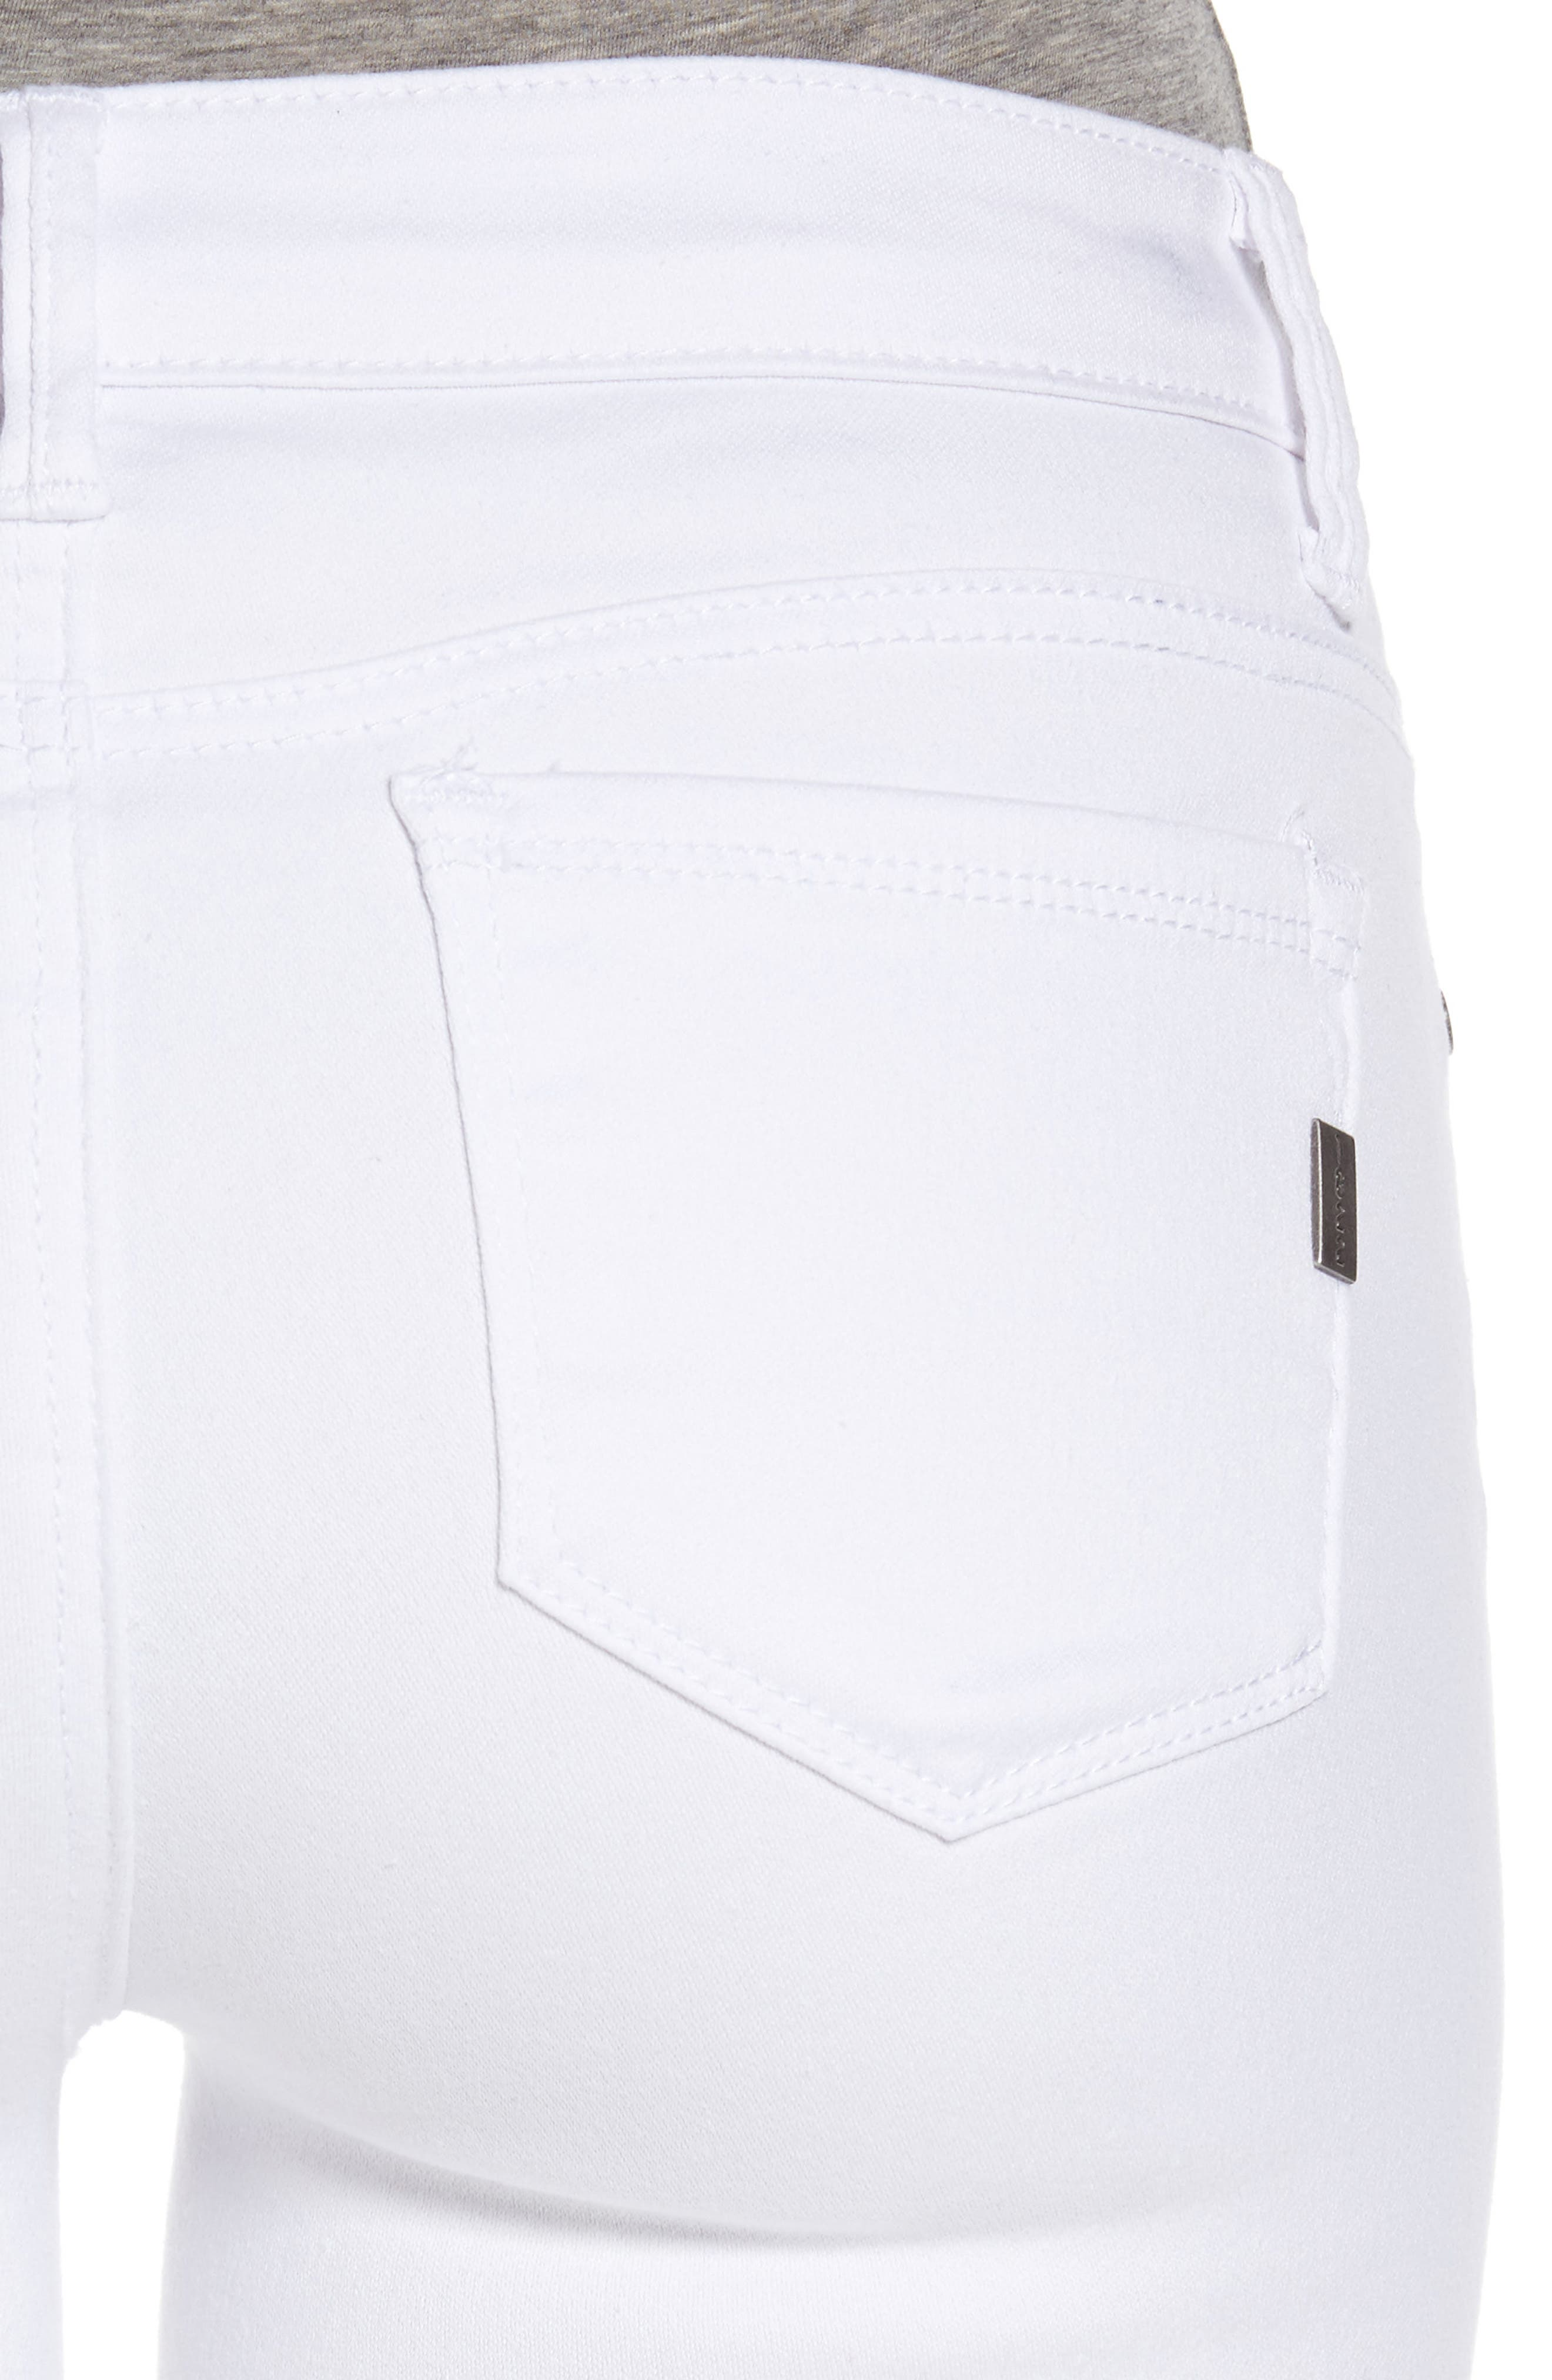 1822 Butter Skinny Jeans,                             Alternate thumbnail 4, color,                             Wht